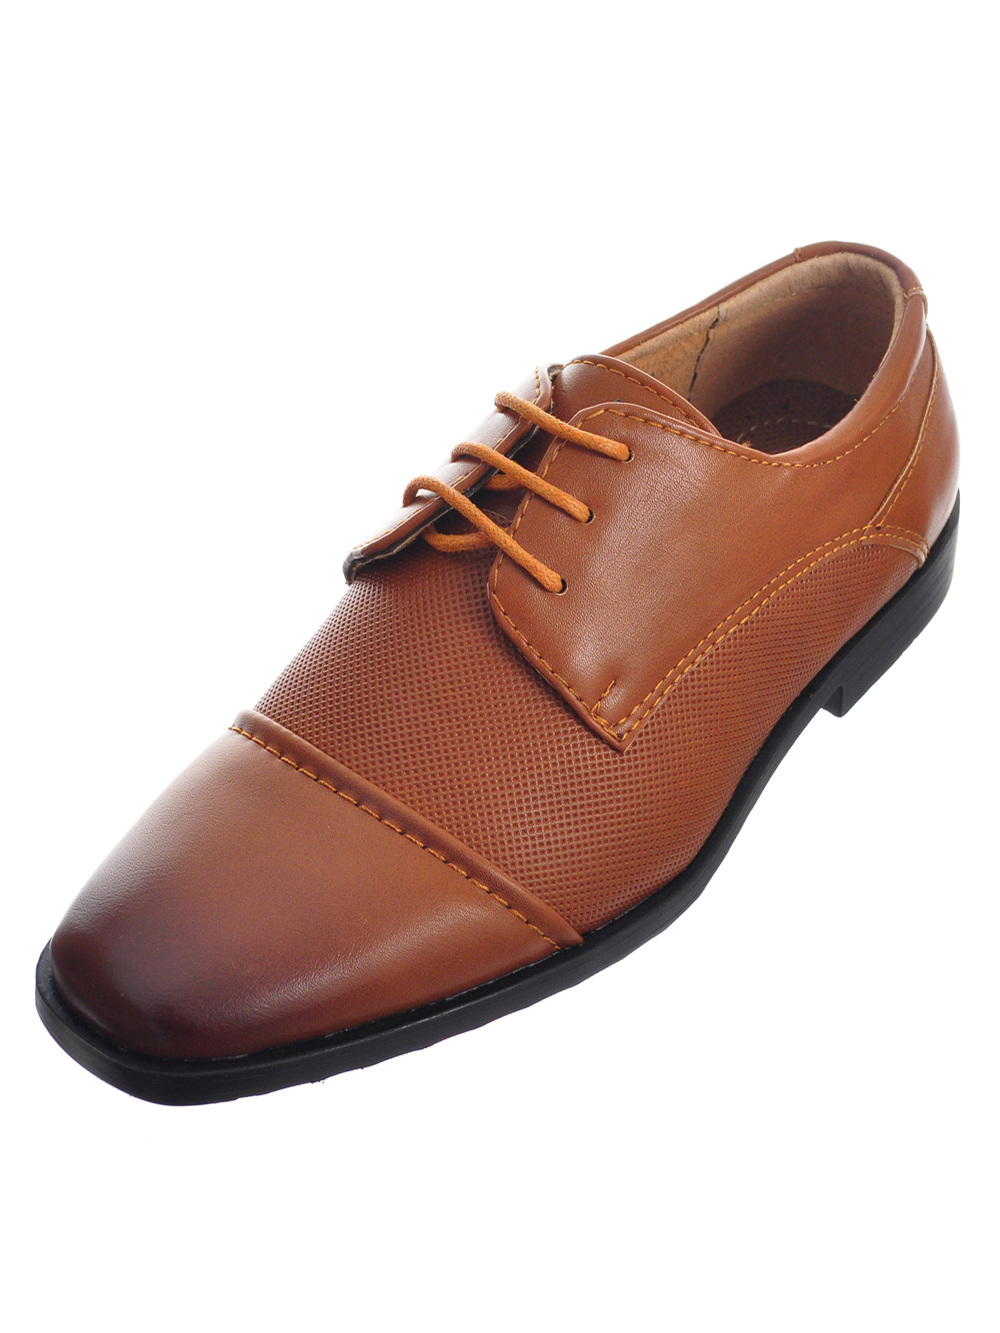 Boys' Dress Shoes (Sizes 6 - 8)